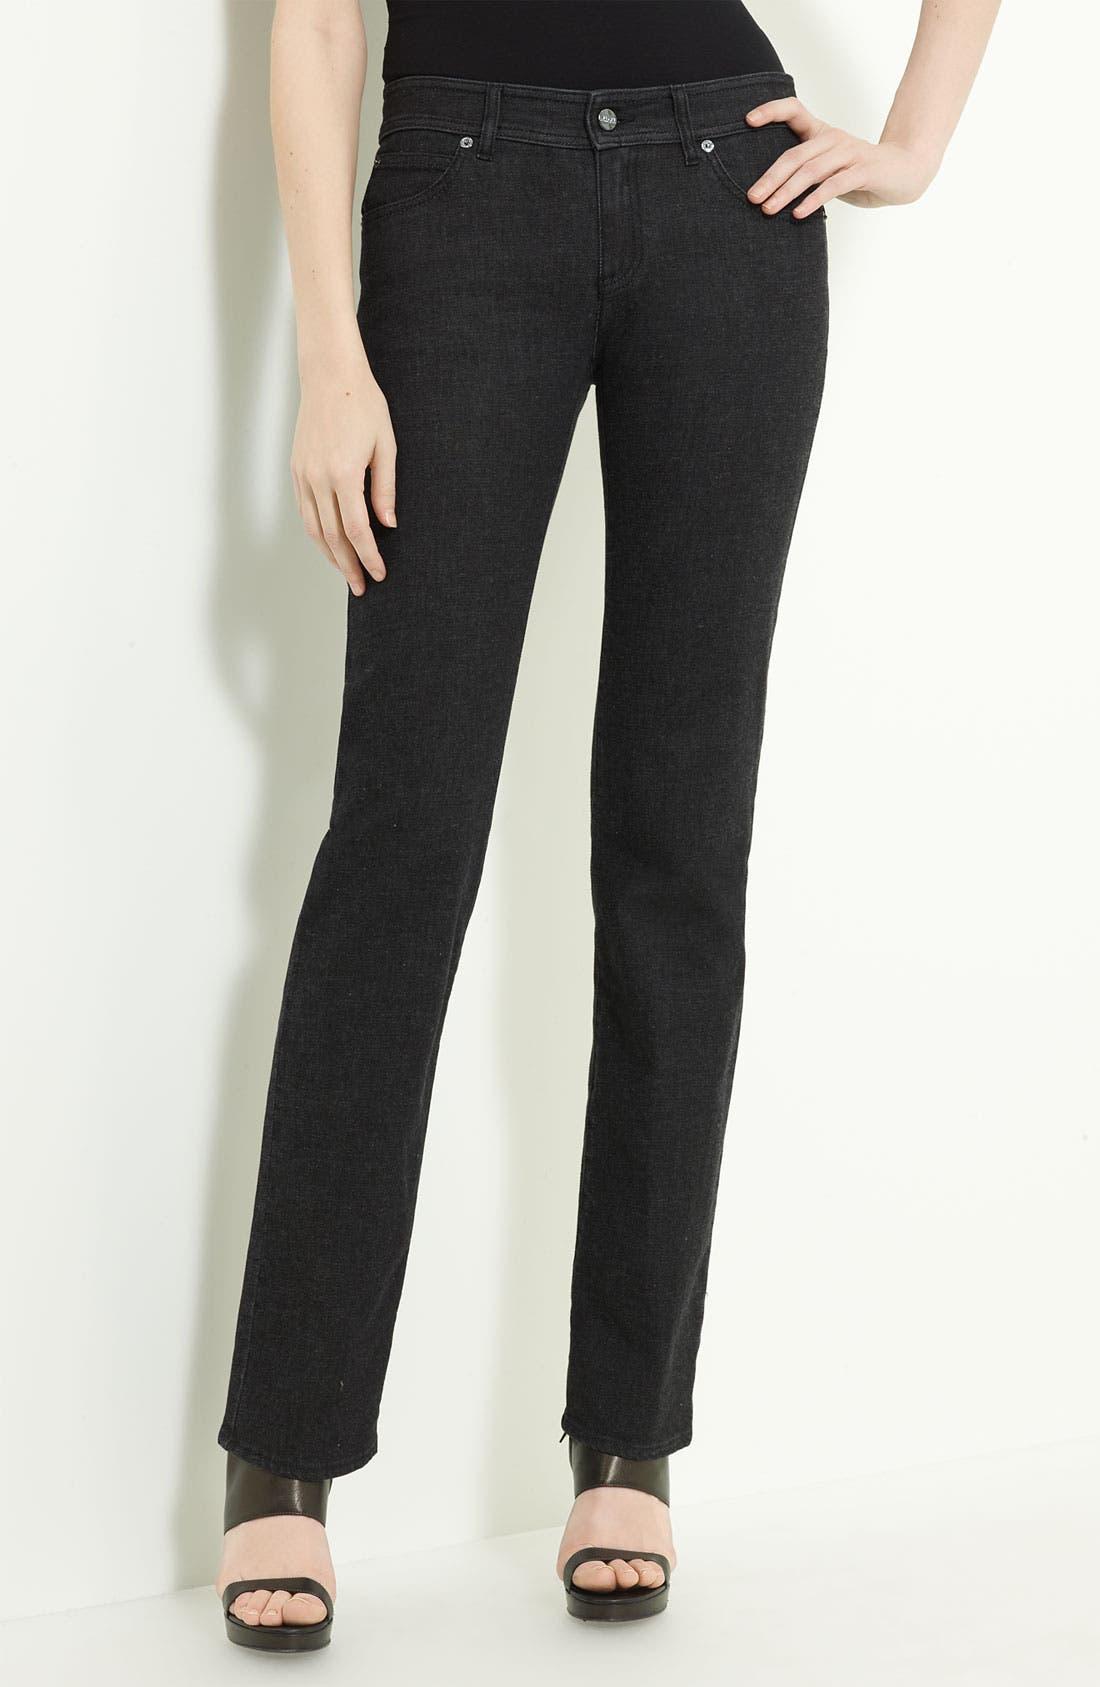 Main Image - Armani Collezioni Cashmere Stretch Denim Jeans